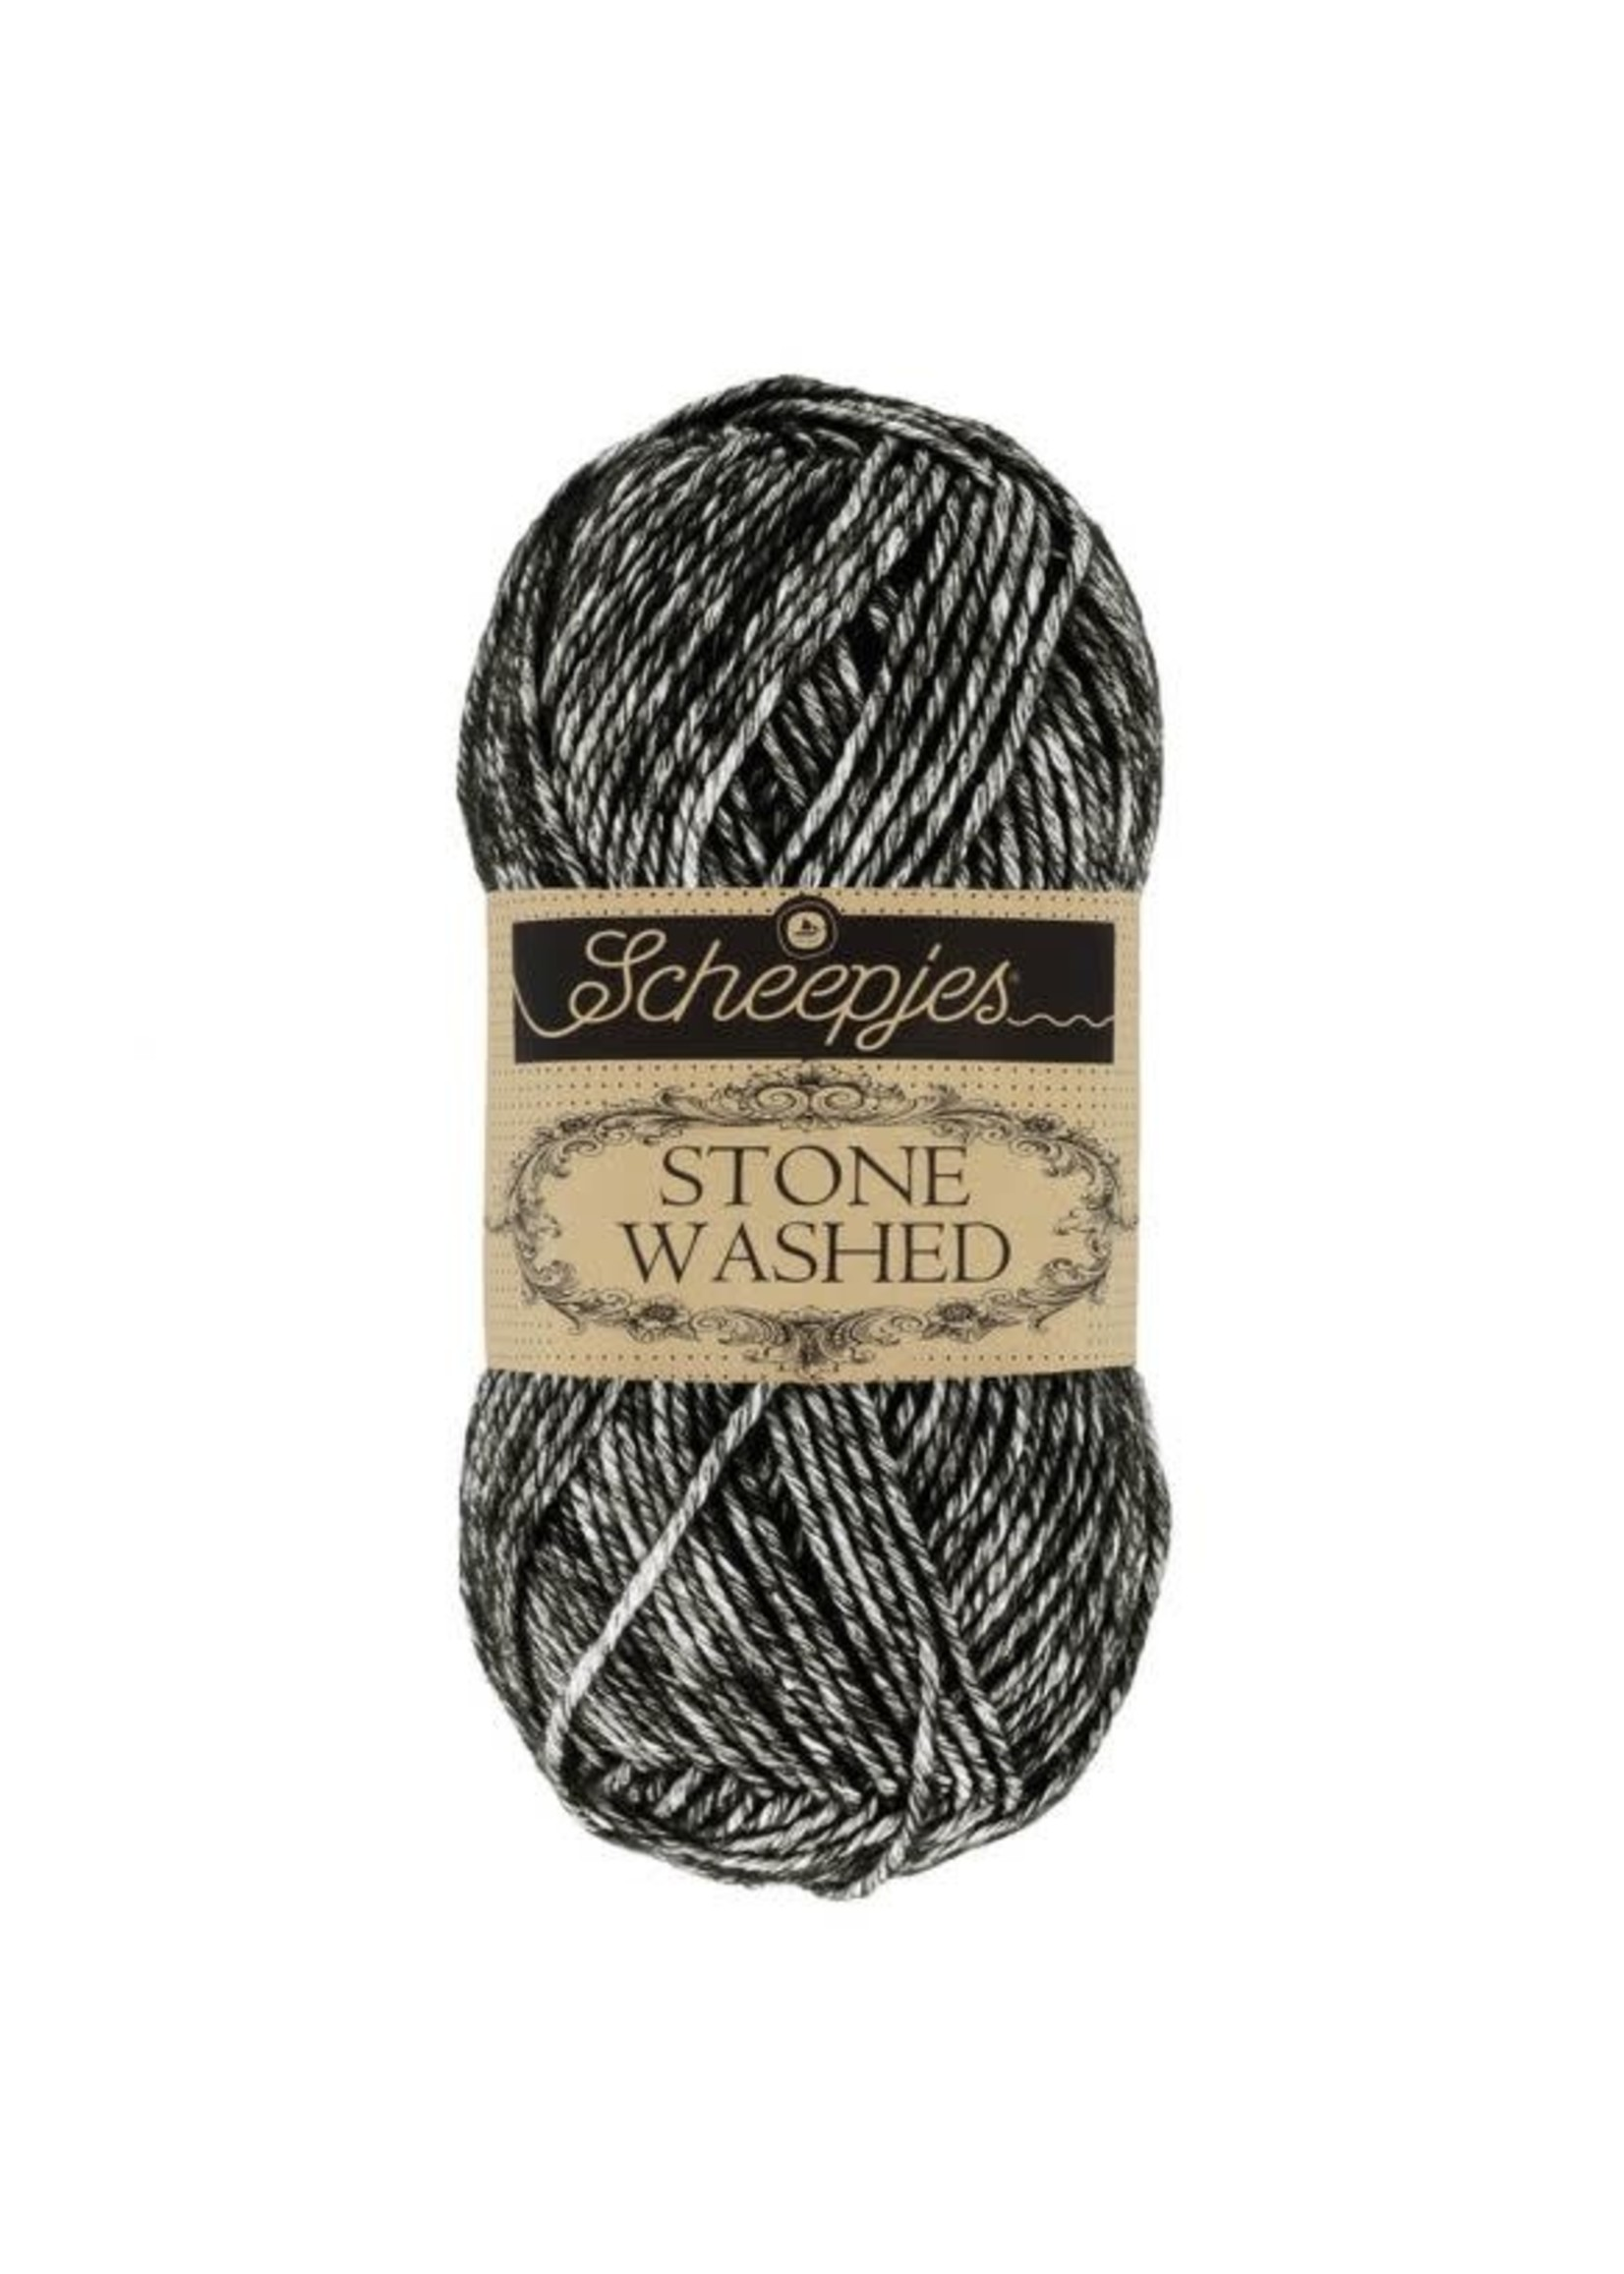 Scheepjes Stone Washed 50gr - 803 Black Onyx